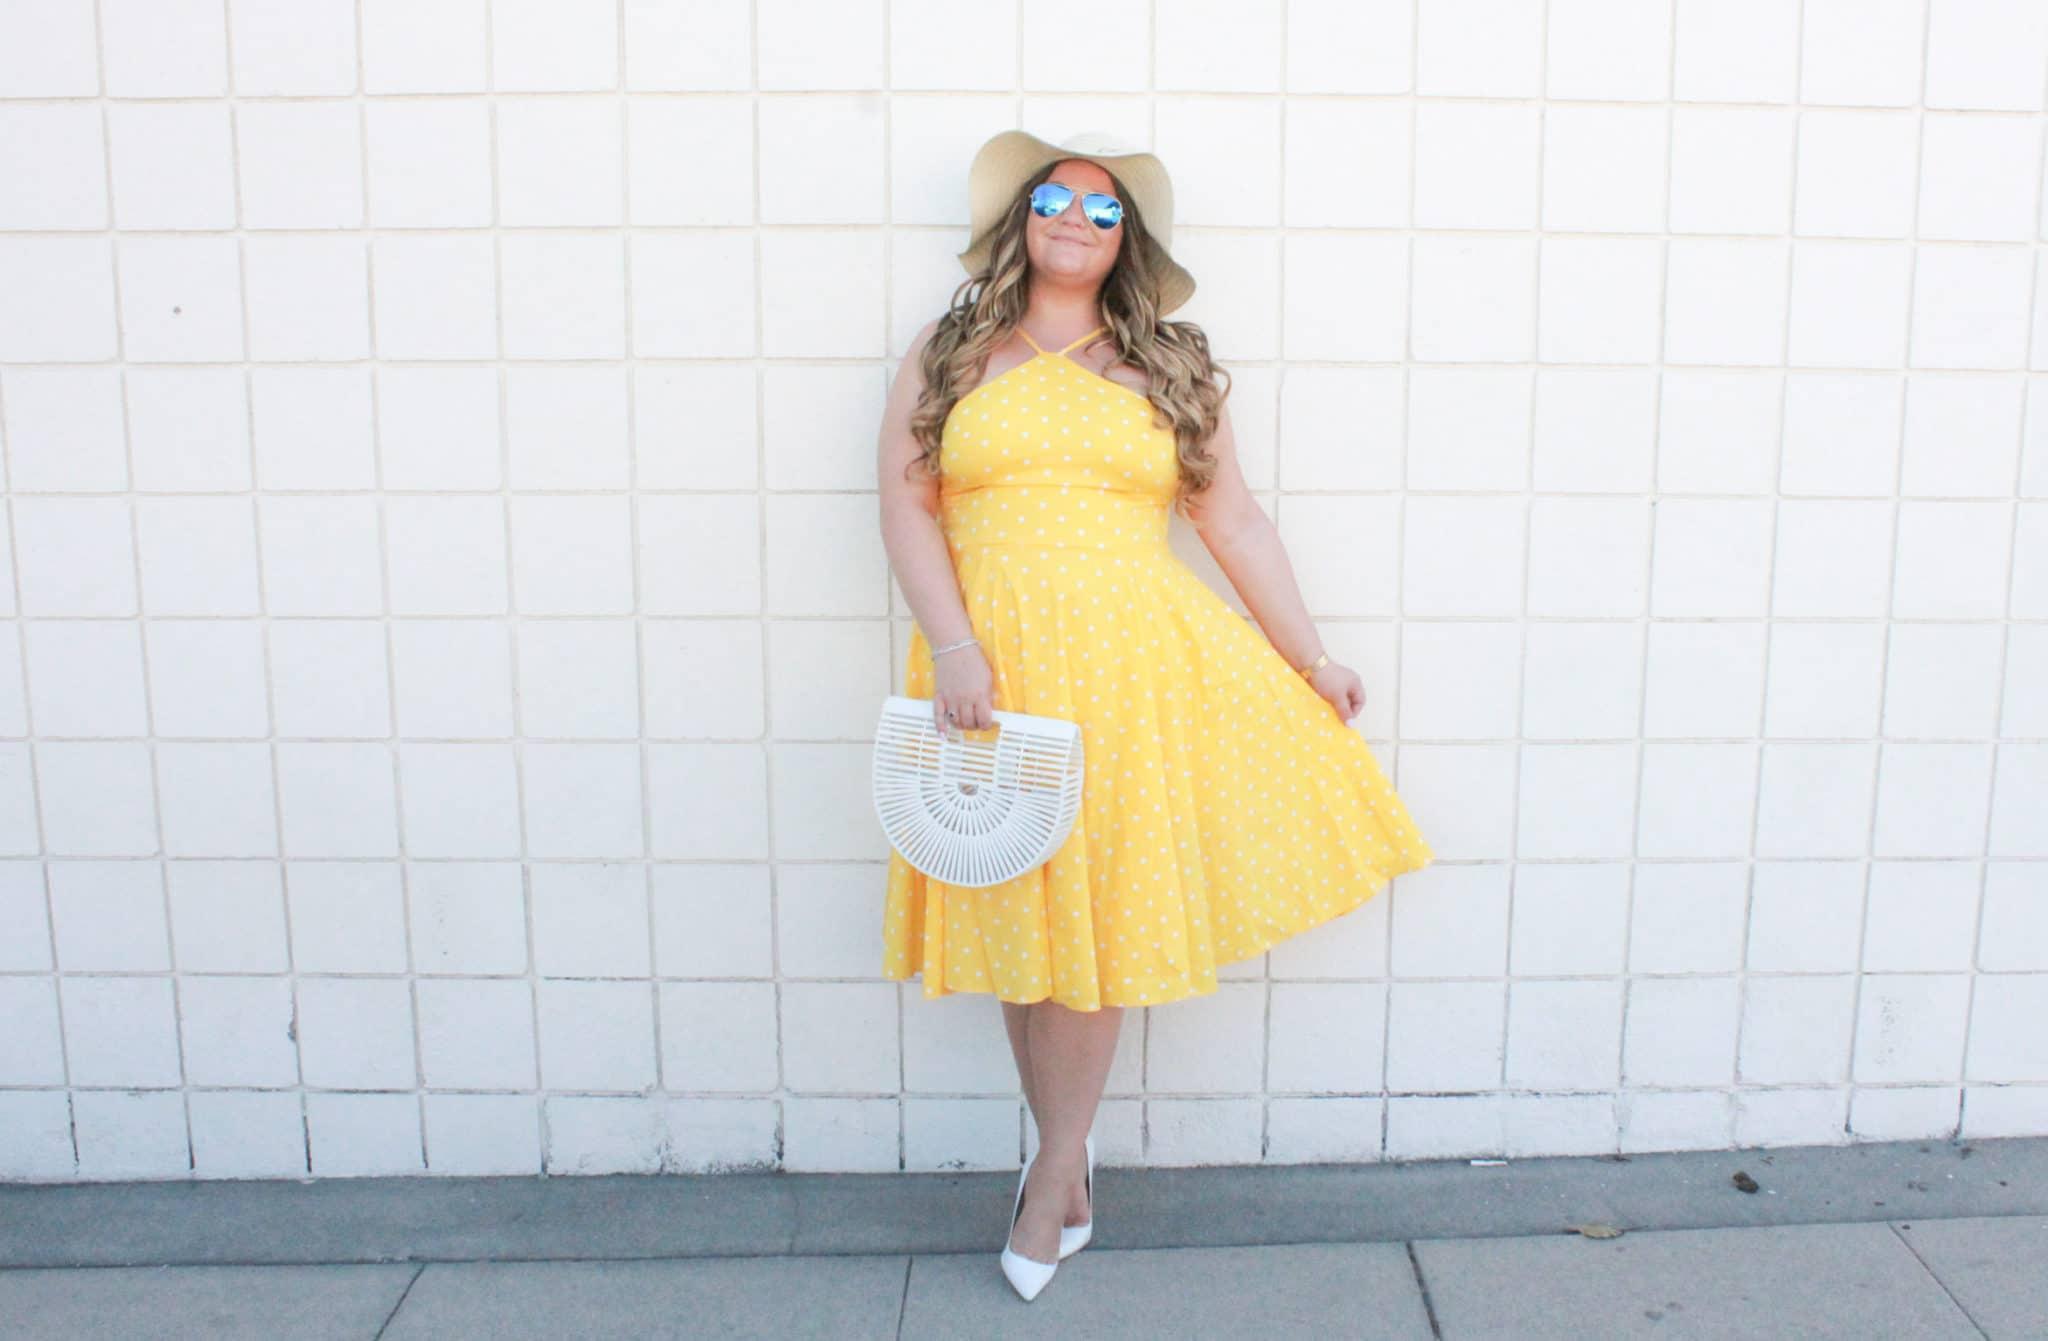 missyonmadison, missyonmadison blog, missyonmadison blogger, missyonmadison instagram, la blogger, fashion blog, fashion blogger, style blog, style blogger, venus swimwear, yellow polka dot dress, yellow dress, white pumps, white pointed toe pumps, la blogger, fashion inspo, summer outfit inspo, white ark bag, white cult gaia bag, raybans, bloglovin, outfit inspo, sunshine and chill floppy hat, beach floppy hat, beach hat, floppy hat,